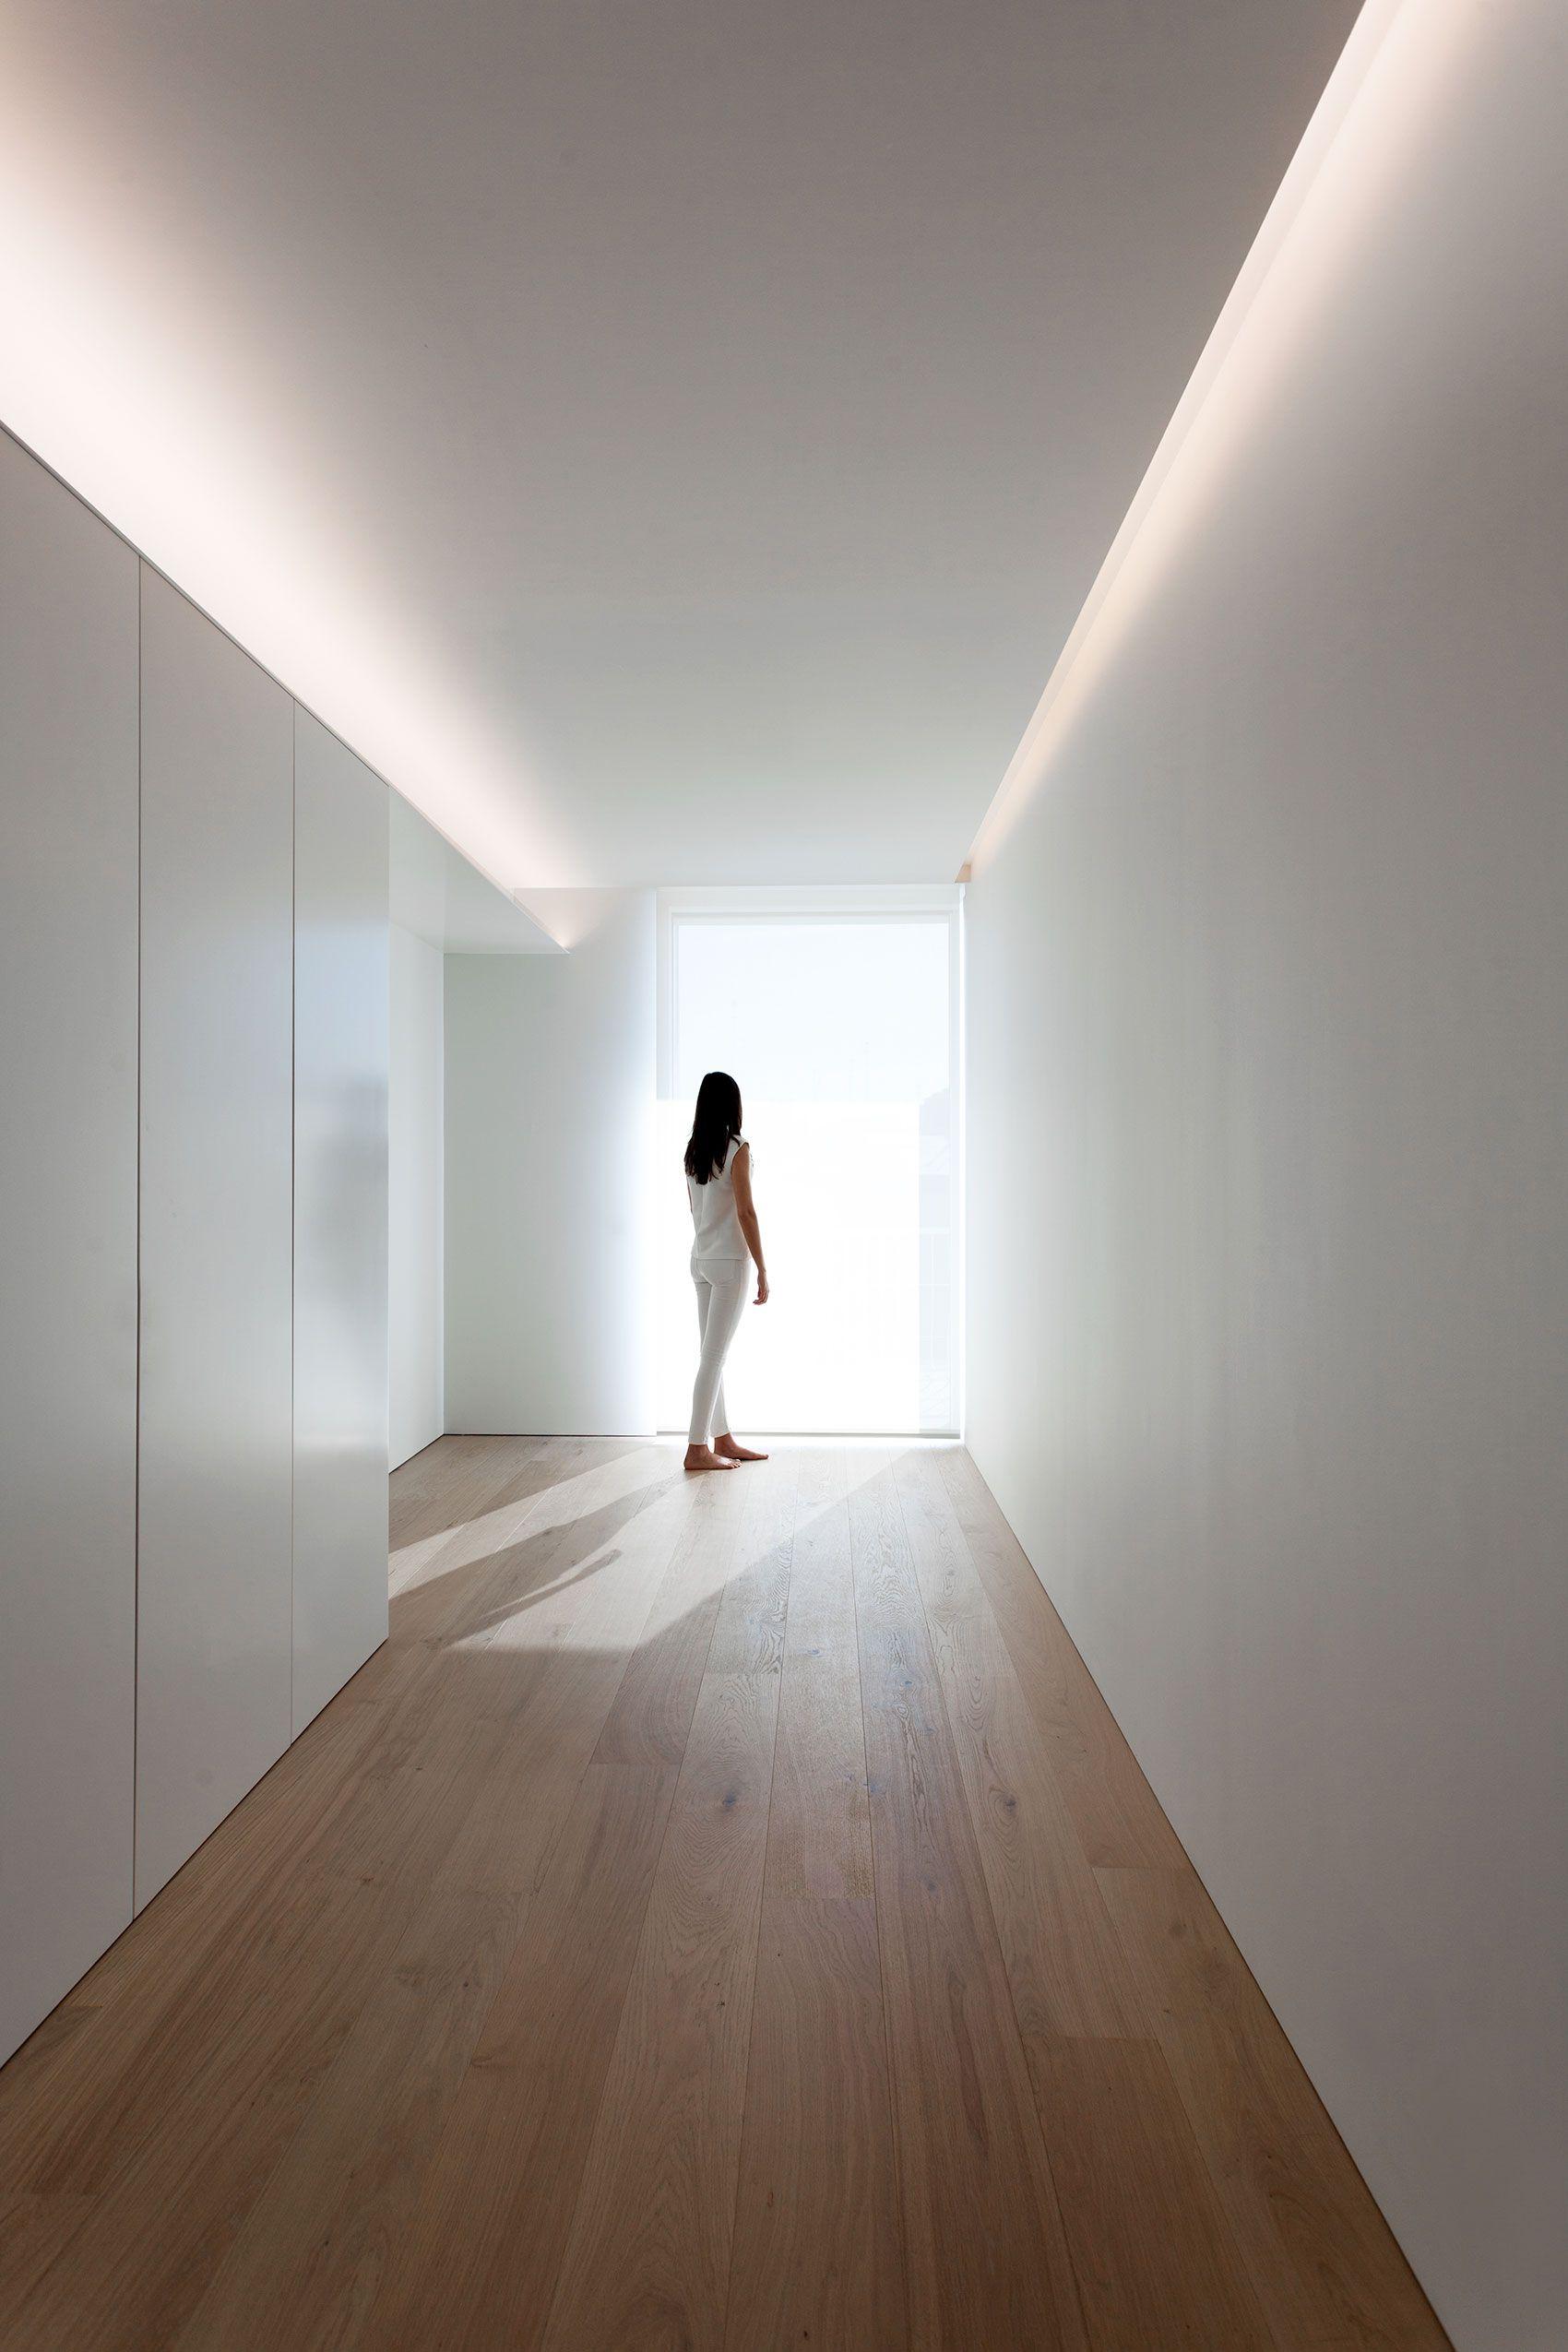 Casa en ruzafa arquitectos valencia fran silvestre - Iluminacion interior armarios ...